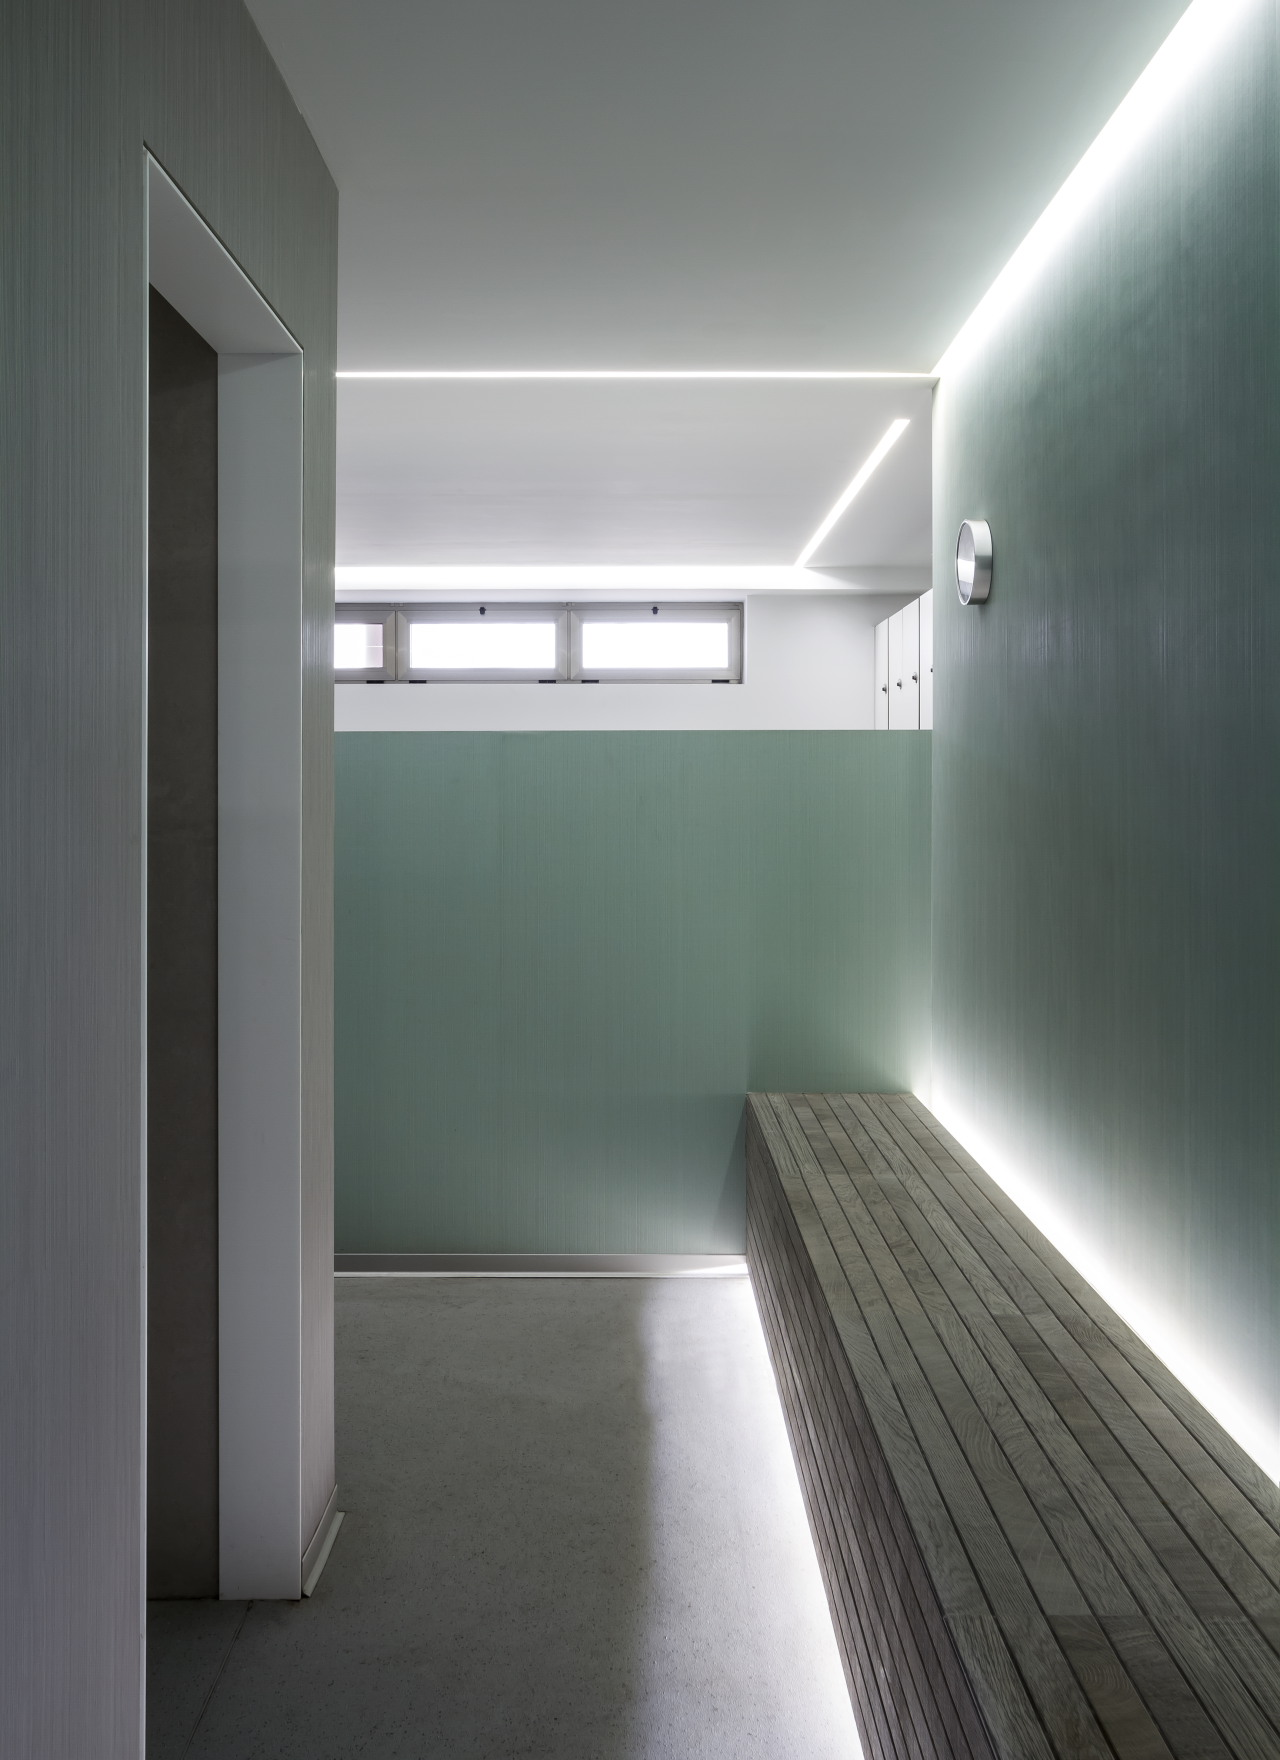 fotografia-arquitectura-valencia-german-cabo-bfm-edificatoria-club-tenis (8)